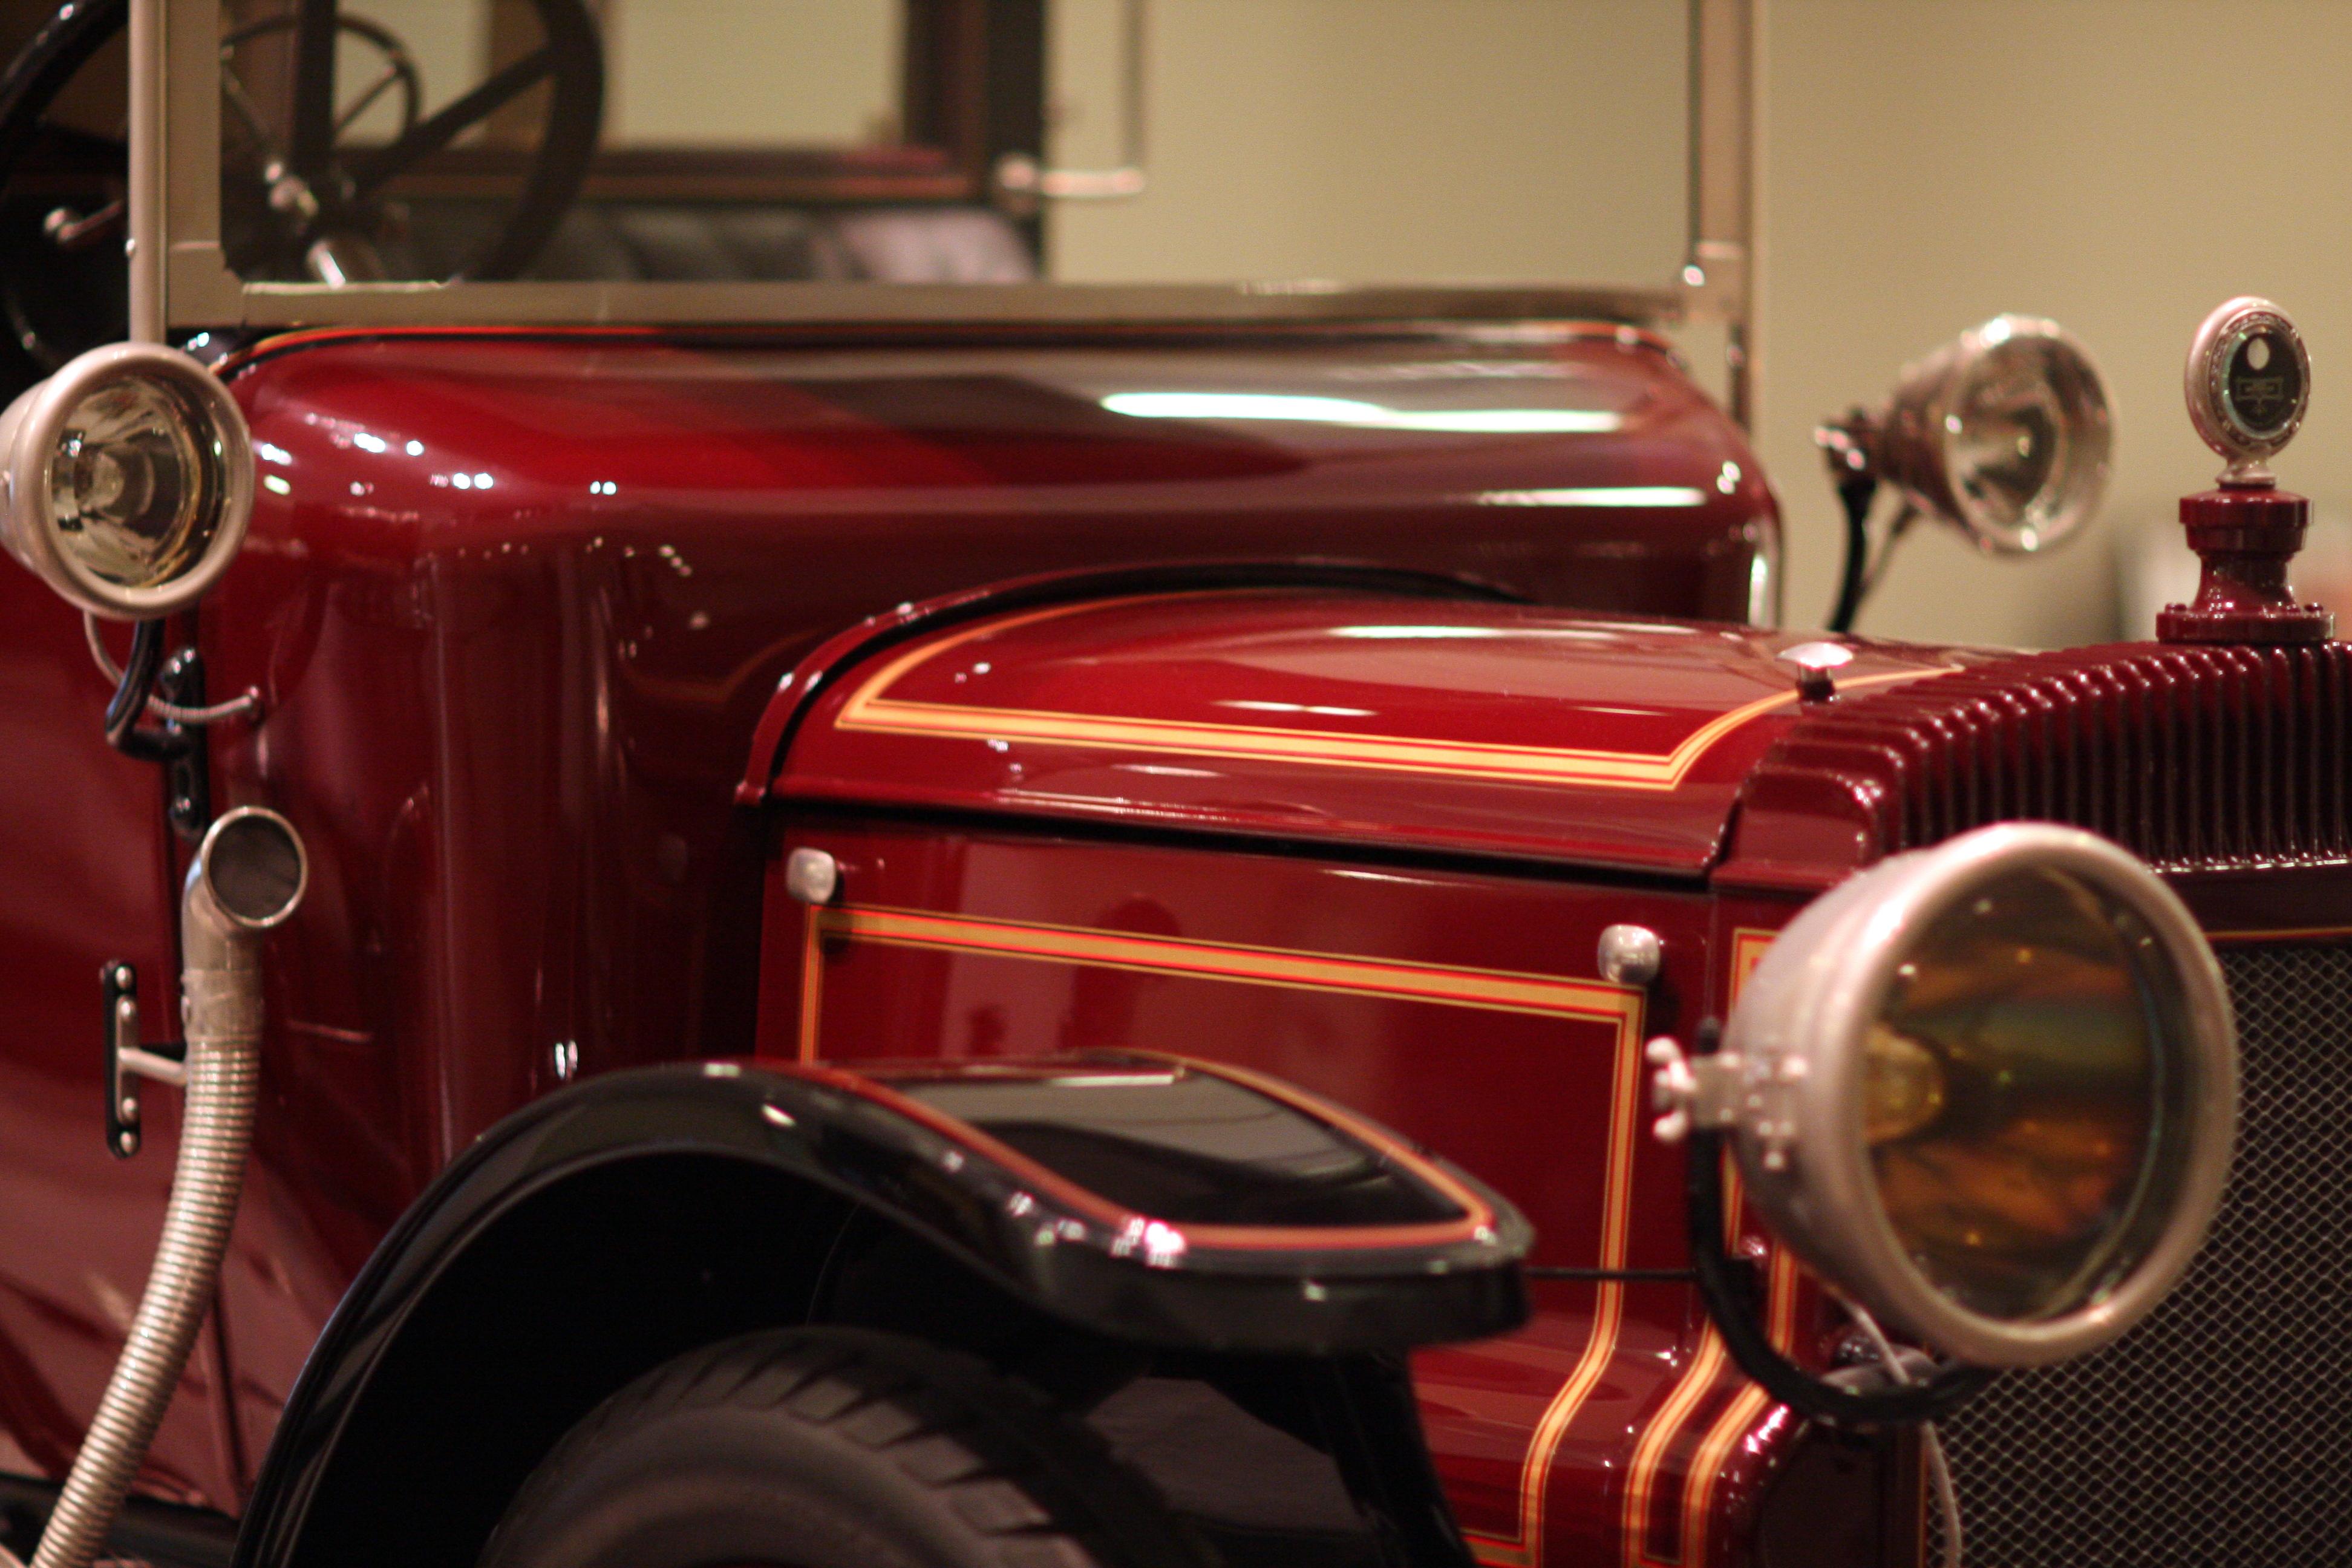 Old Car, Antique, Automobile, Car, Closeup, HQ Photo